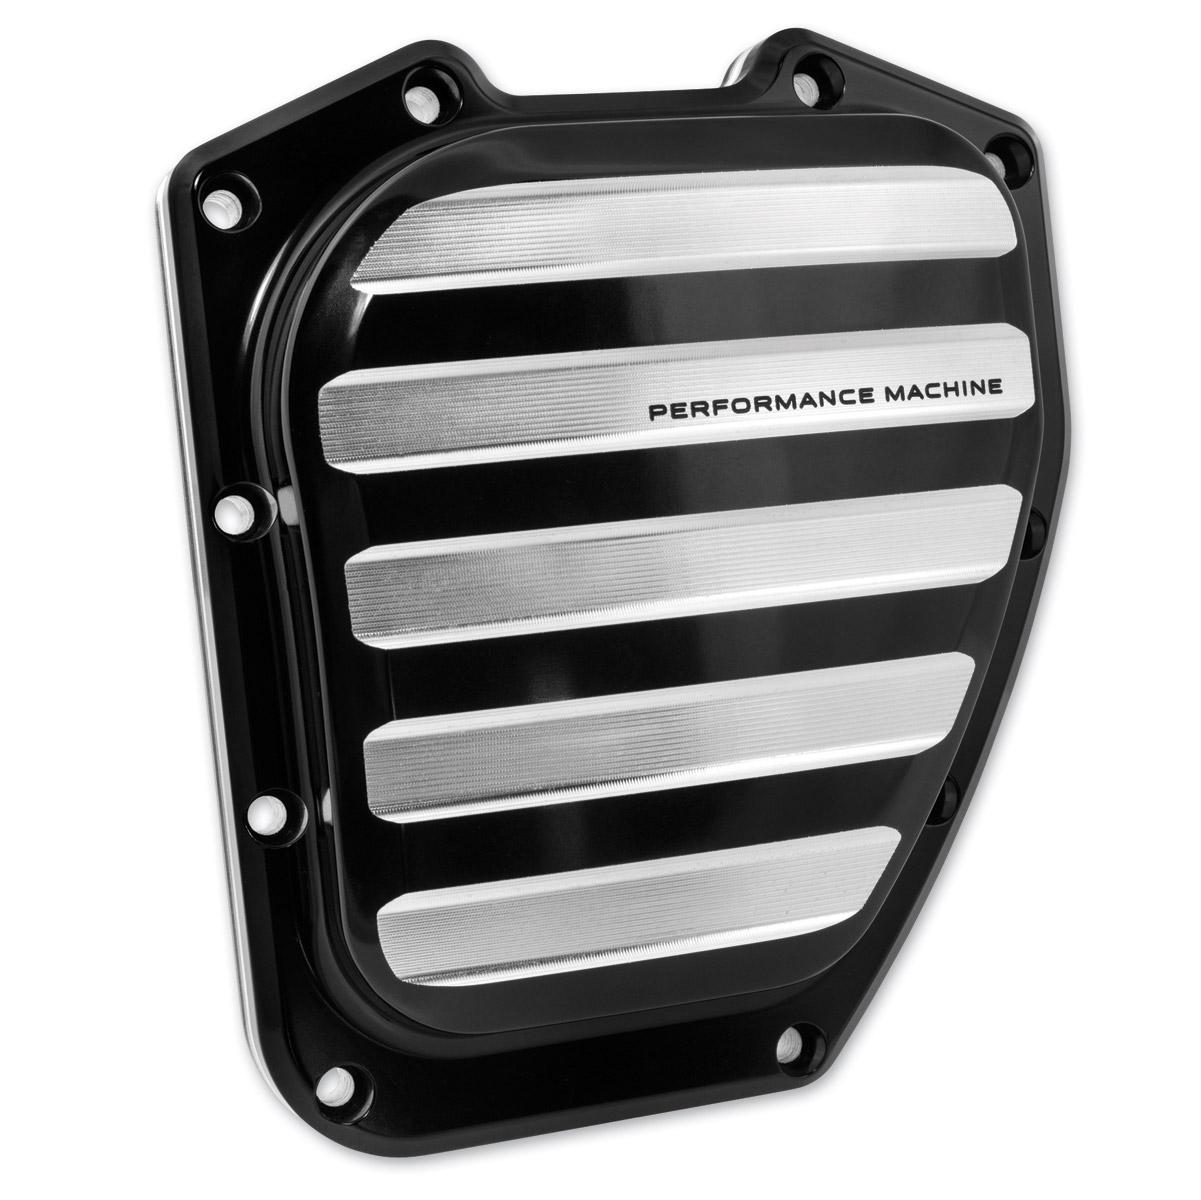 Performance Machine Drive Contrast Cut Camshaft Cover